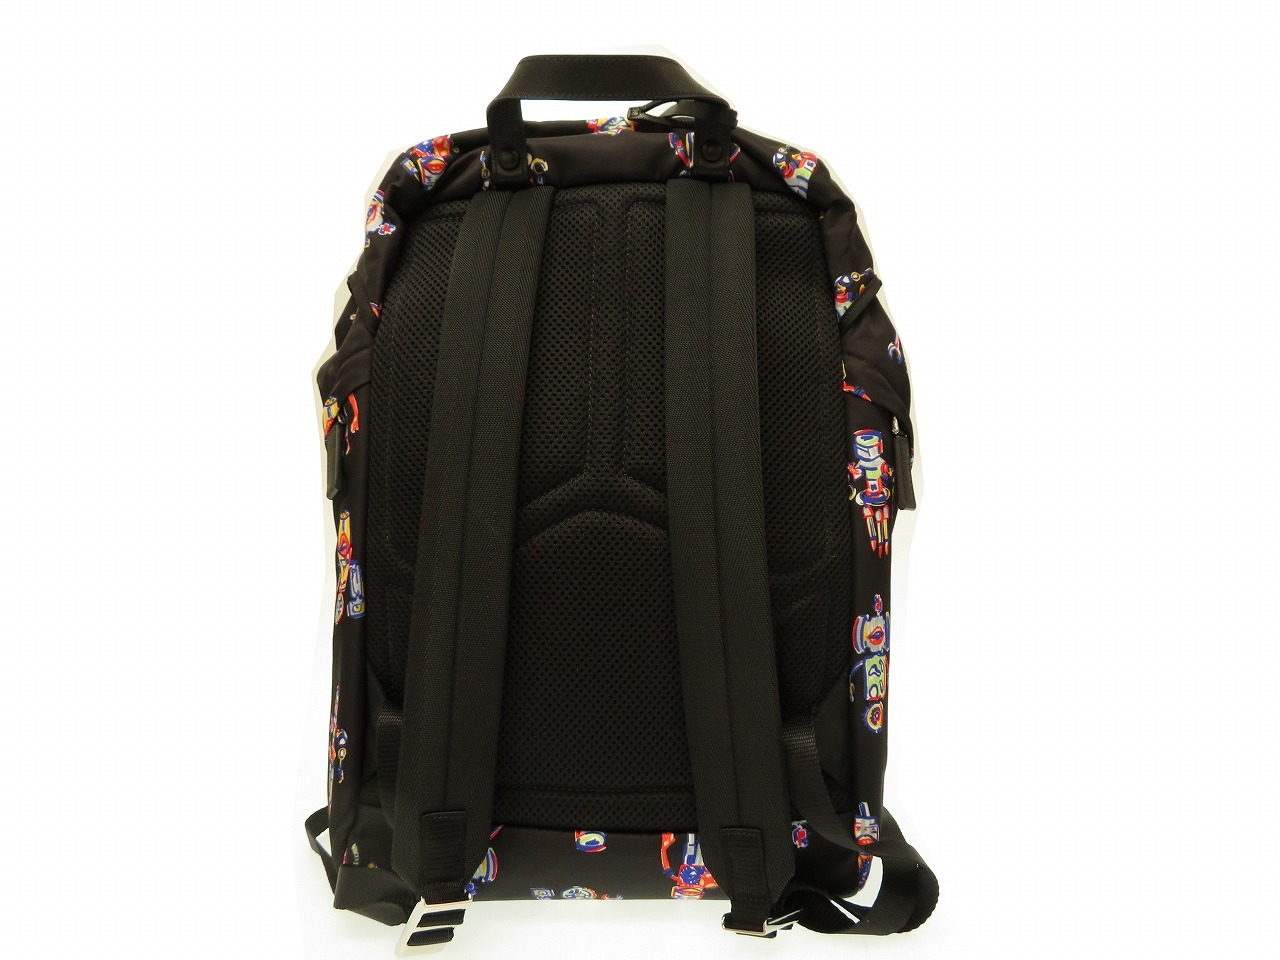 official store prada backpack v135 black guy fb8c5 eac7a cef7c7c9076f4